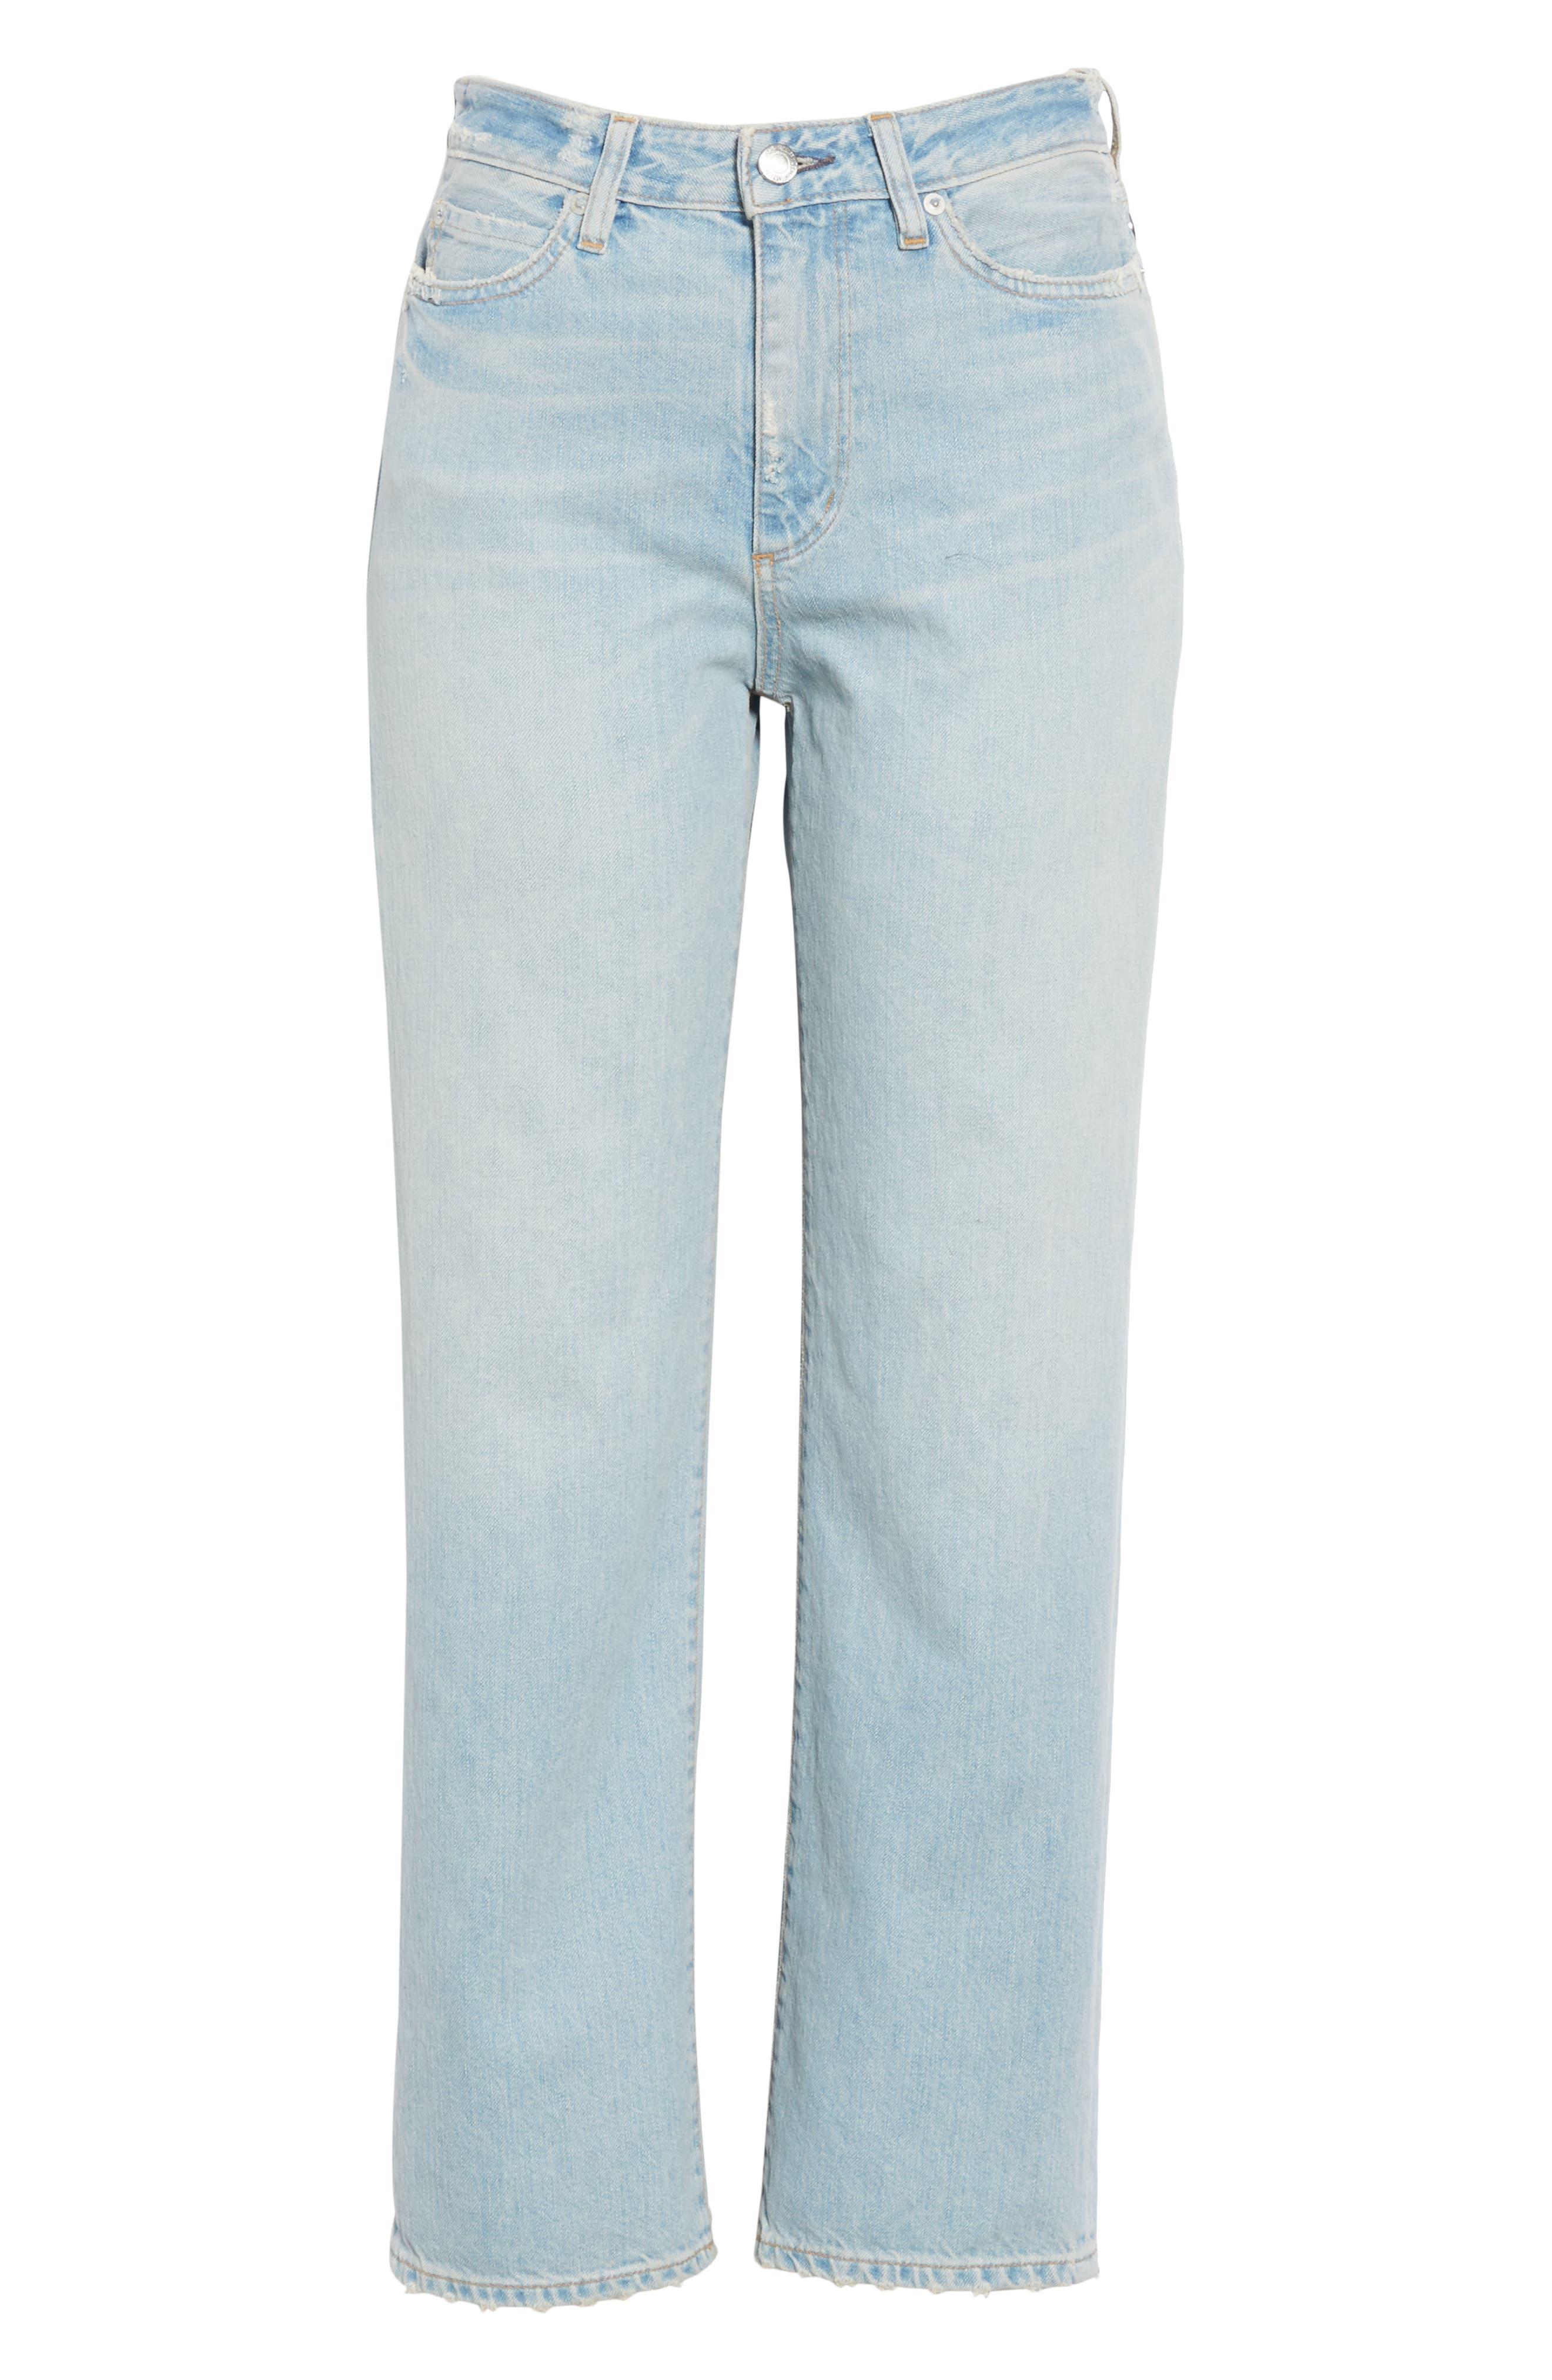 High Waist Crop Jeans,                             Alternate thumbnail 6, color,                             VINTAGE WASH 6